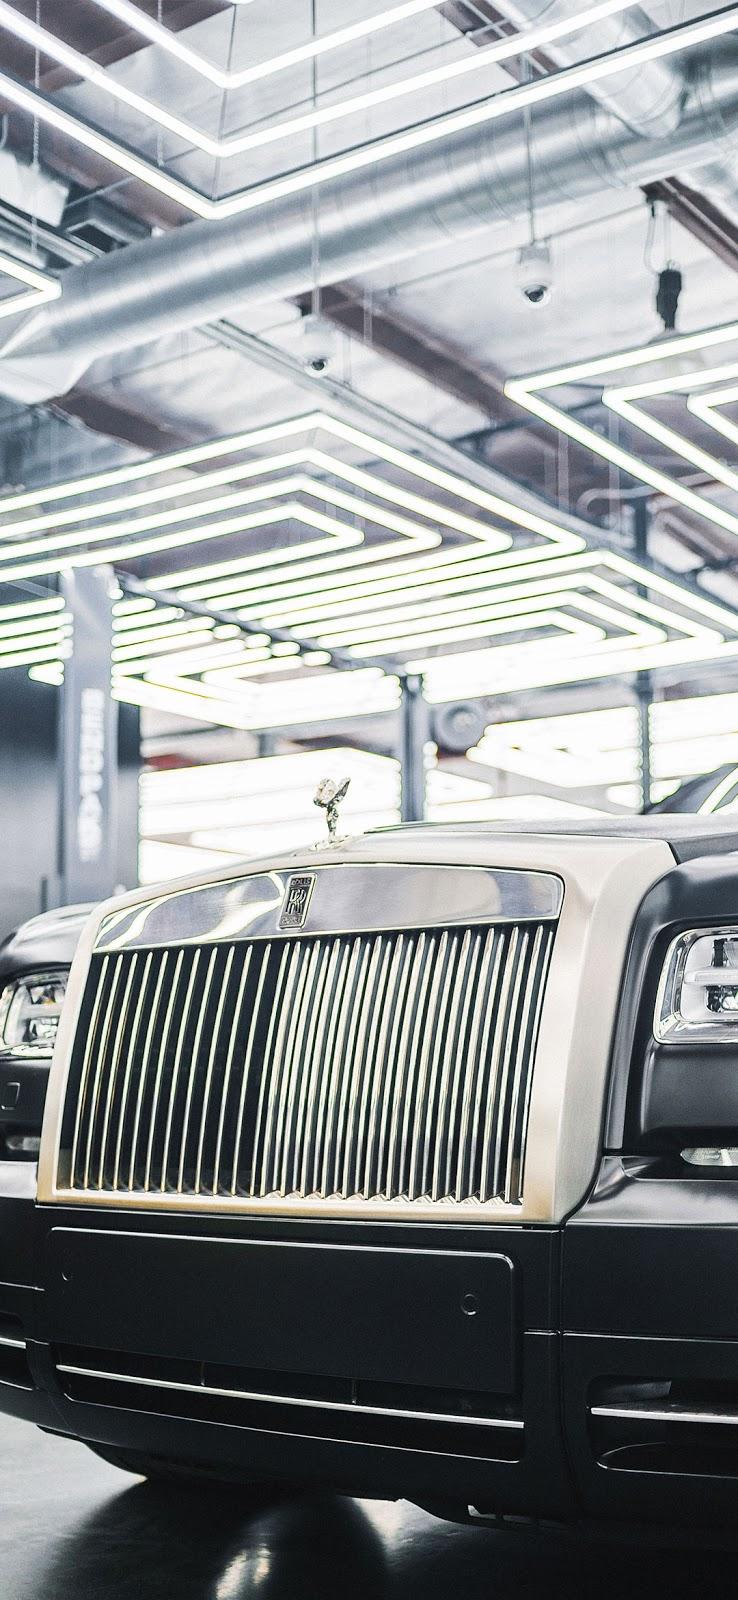 black and silver rolls royce phantom car wallpaper